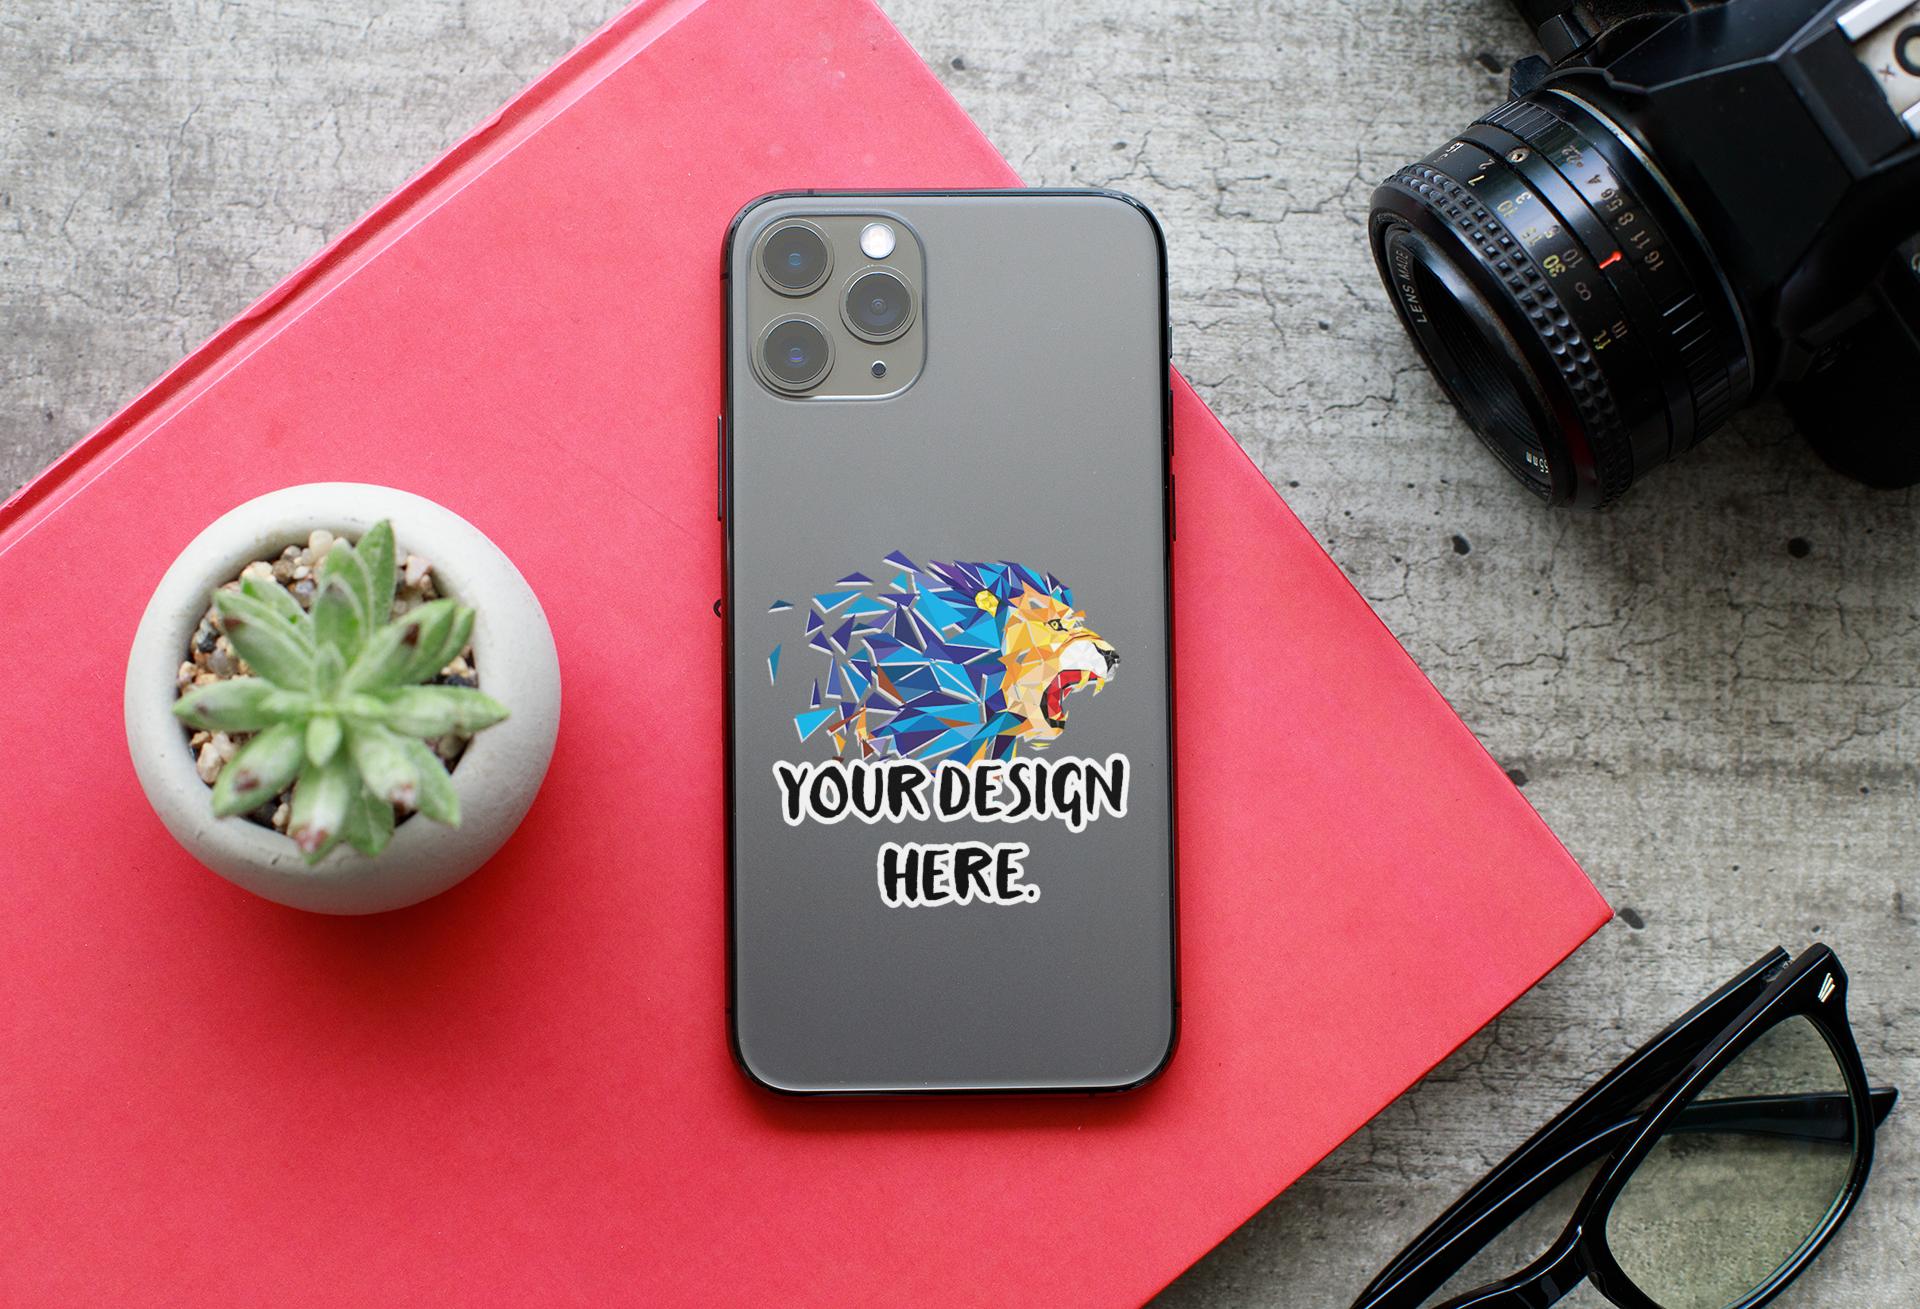 iphone sticker mockup